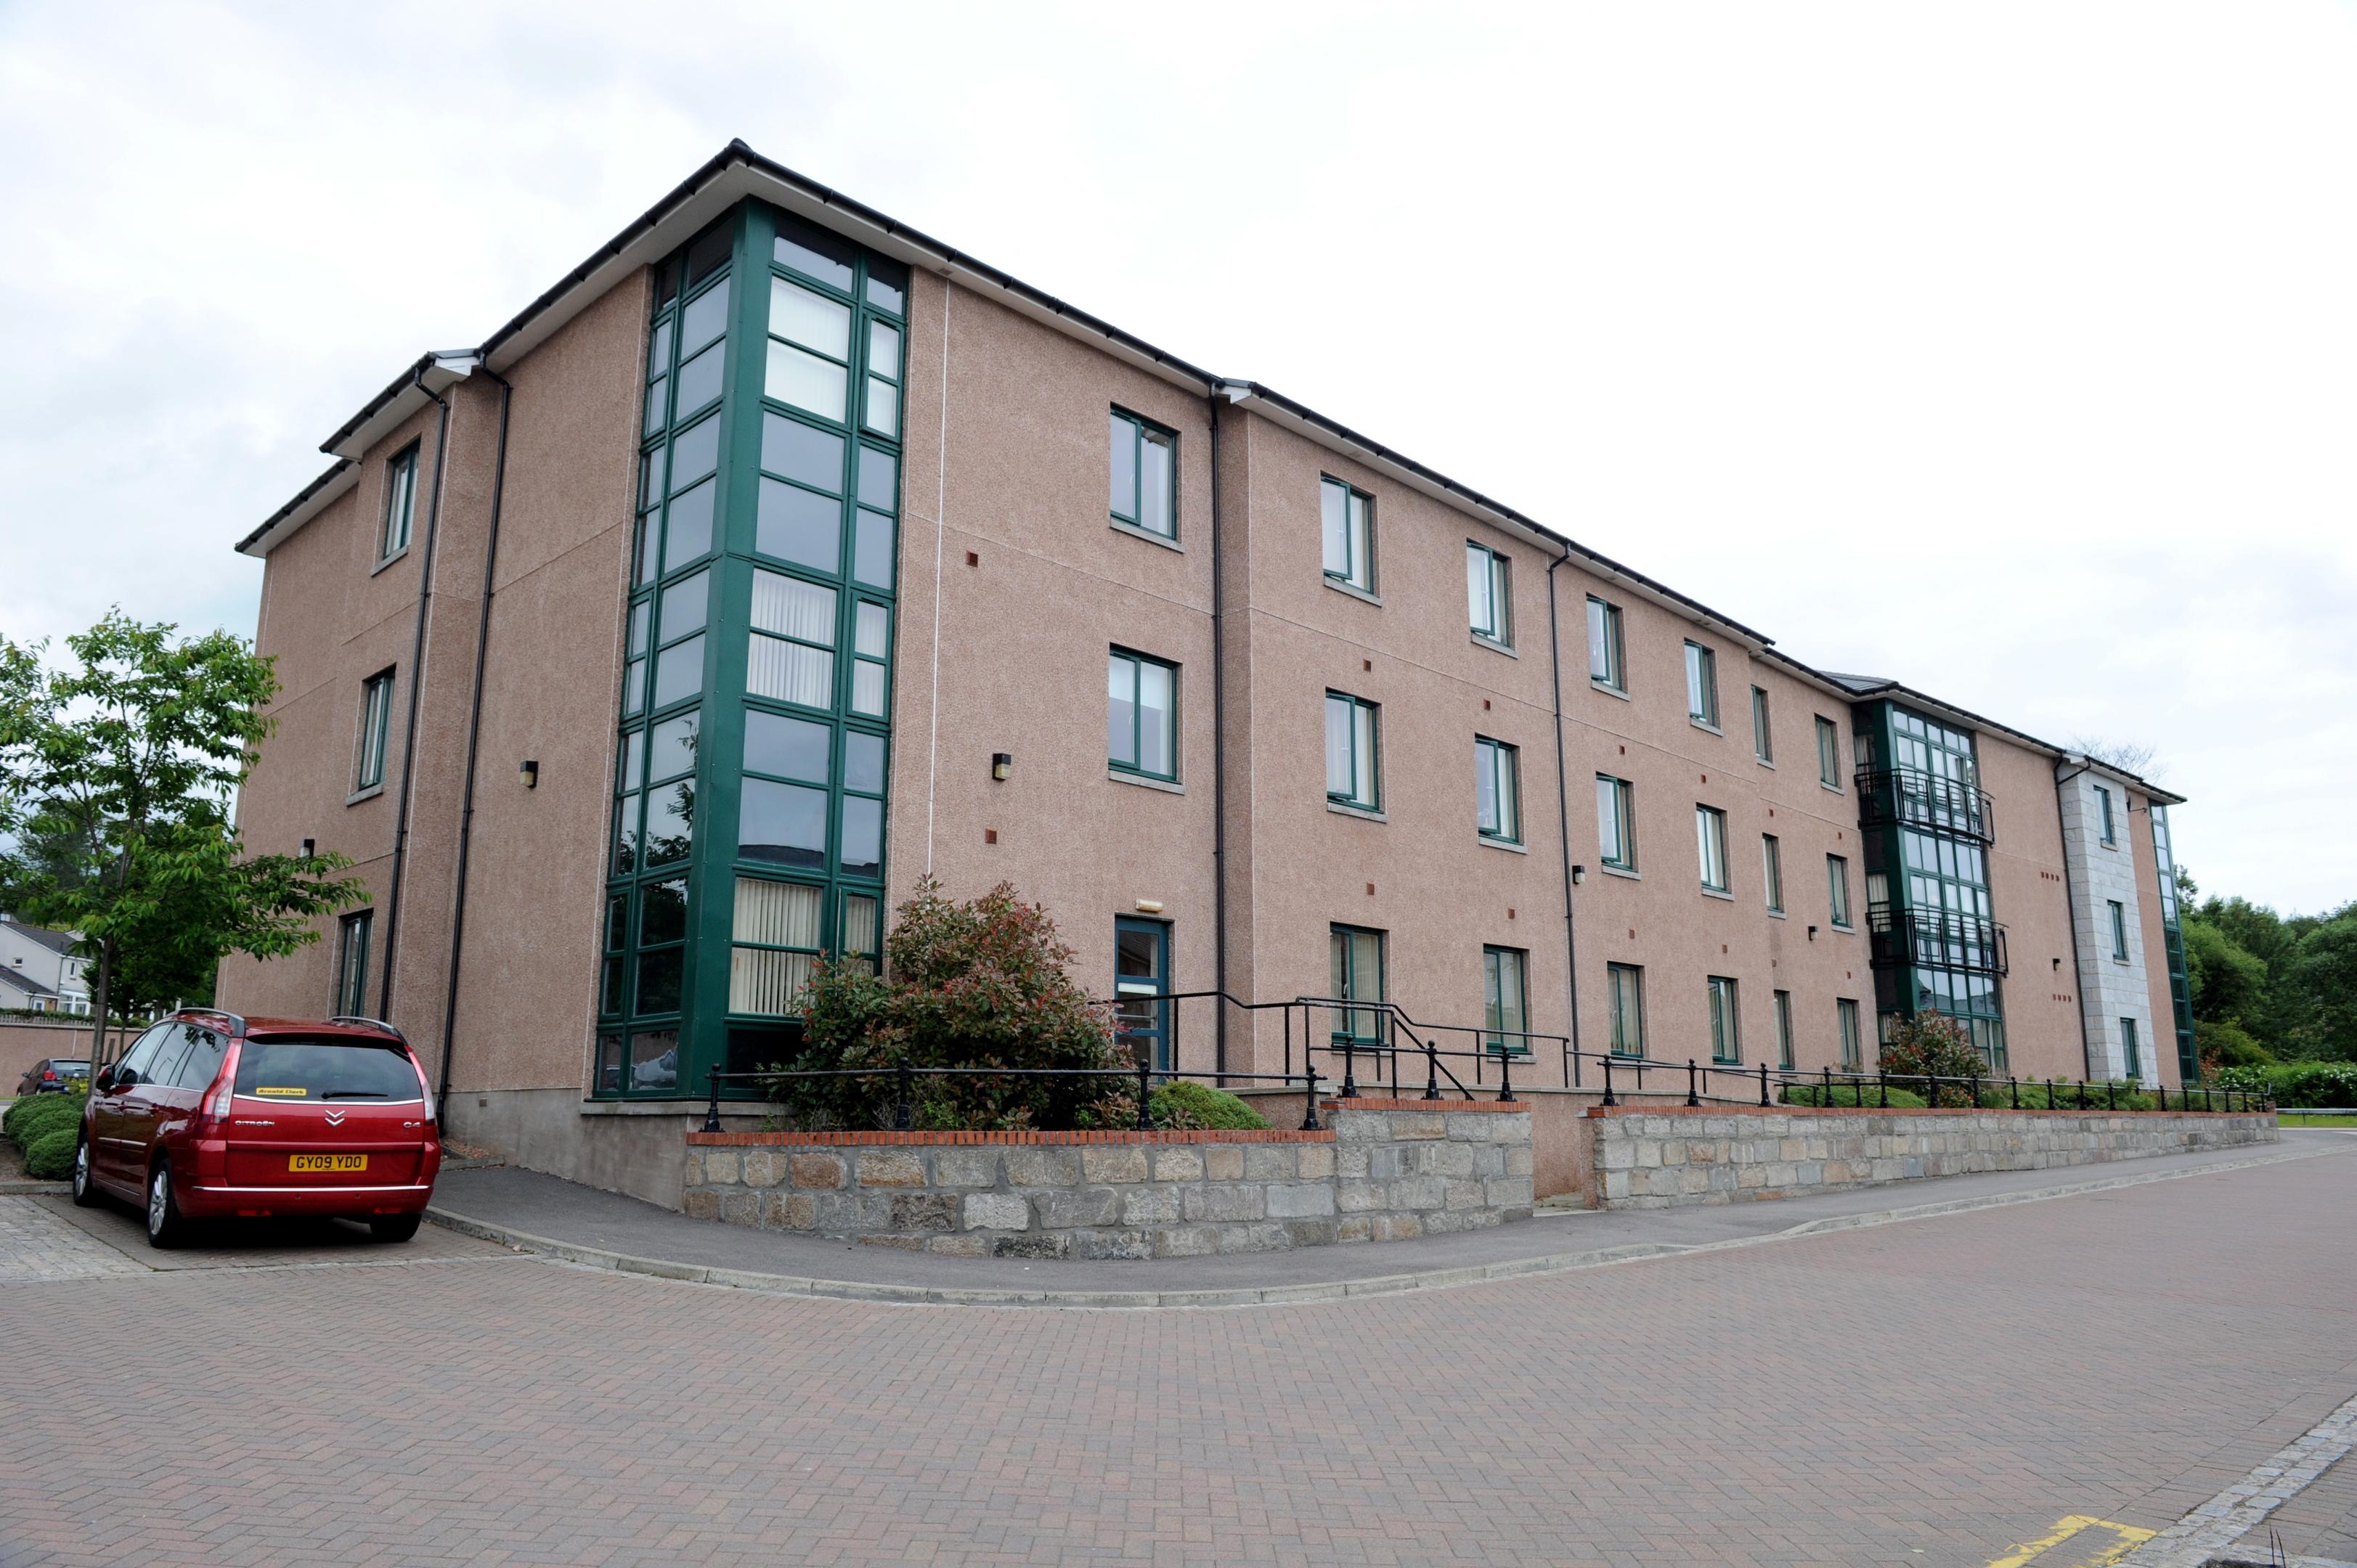 Grandholm Care Home in Bridge of Don, Aberdeen.